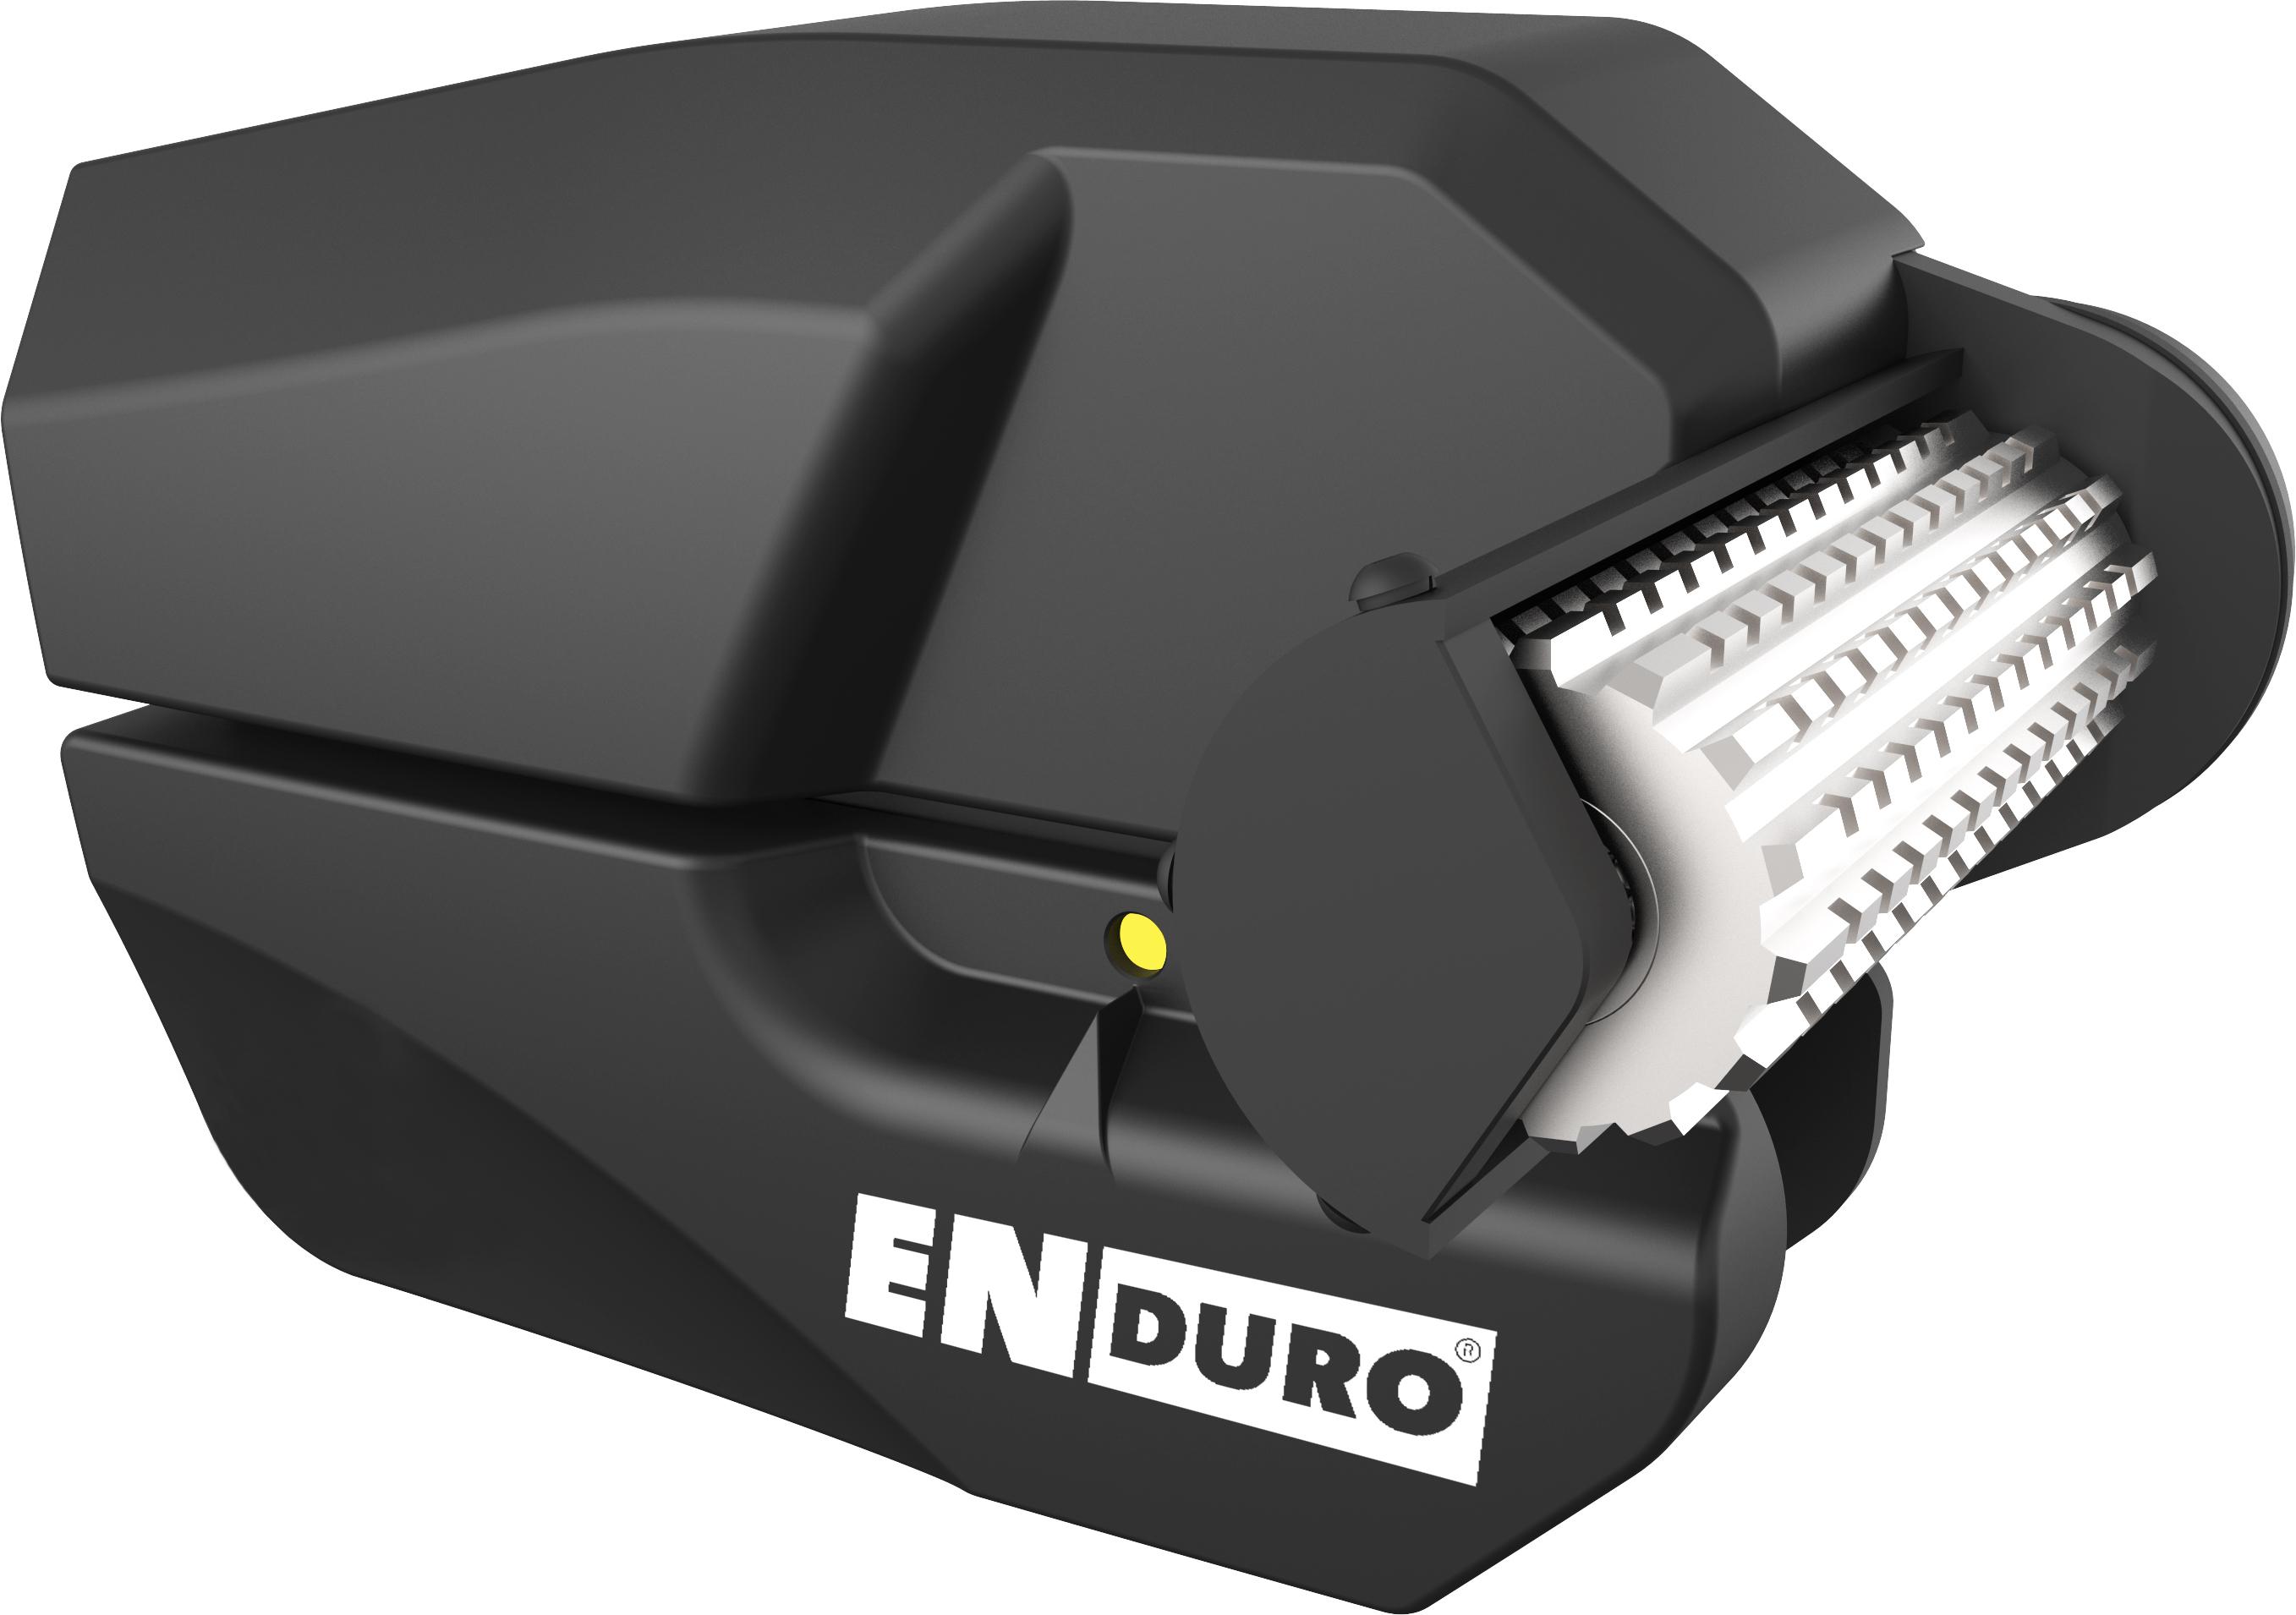 Enduro EM303A+ mover automata 1800 kg